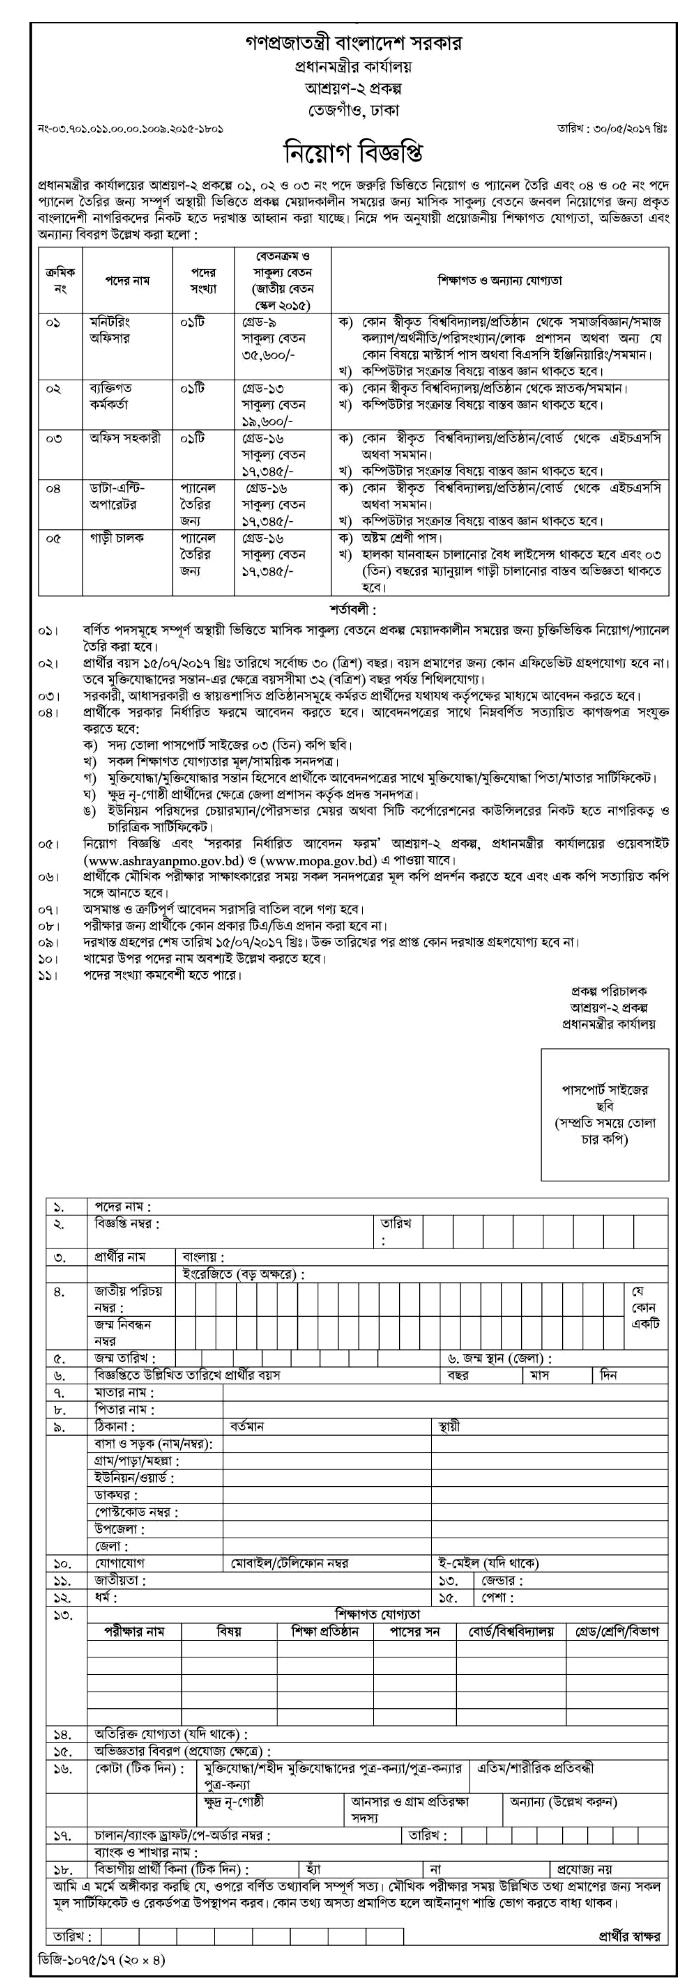 Prime Minister Office Job Circular 2017